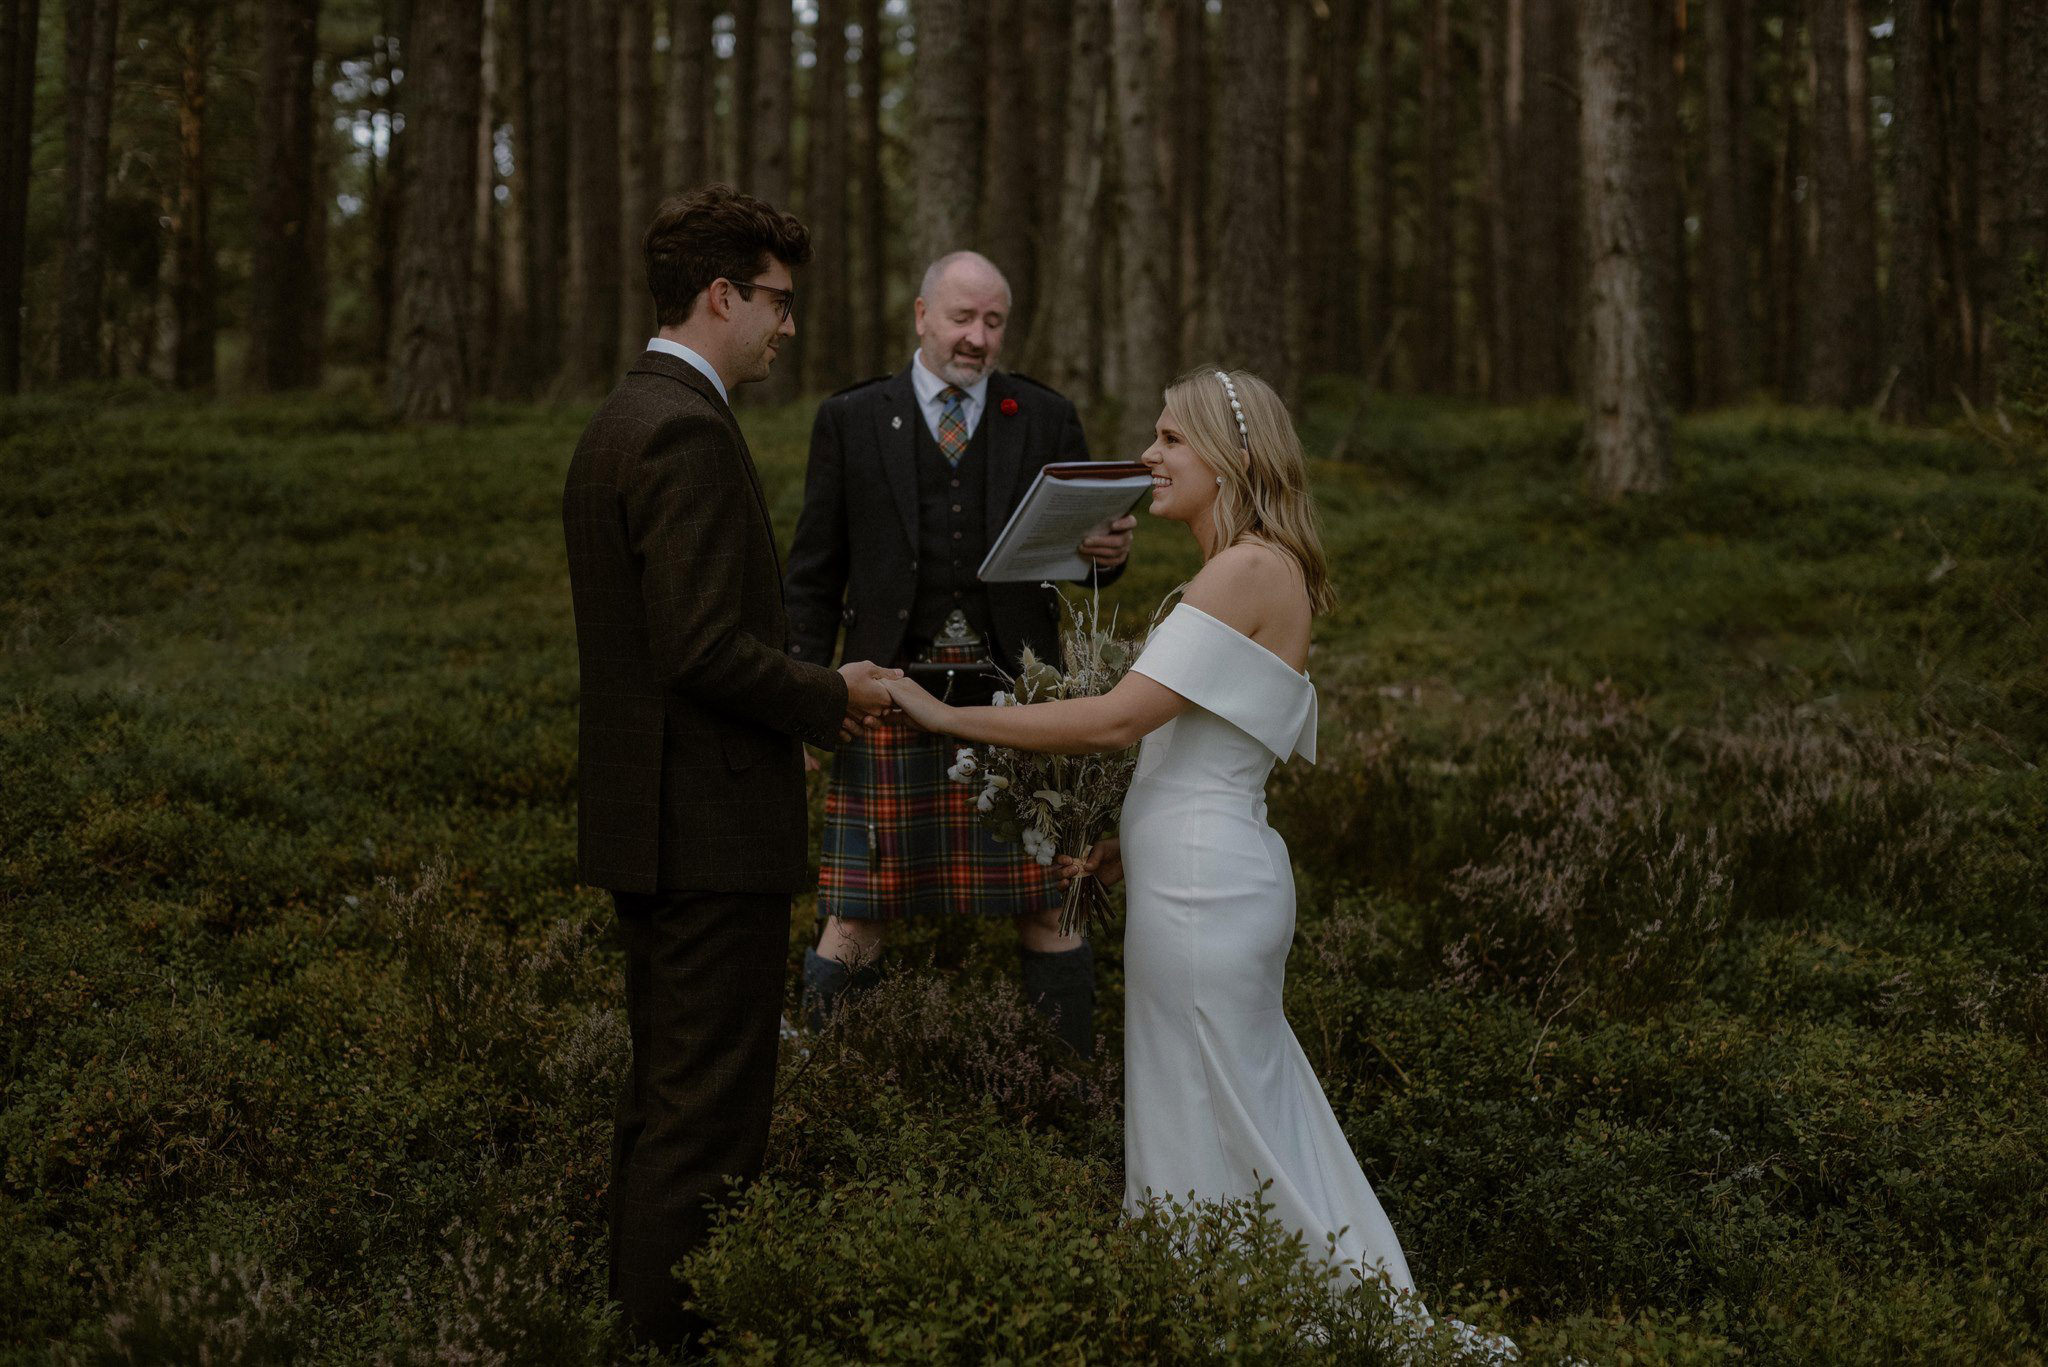 Bride and groom exchange vows at woodland elopement ceremony at Loch Garten